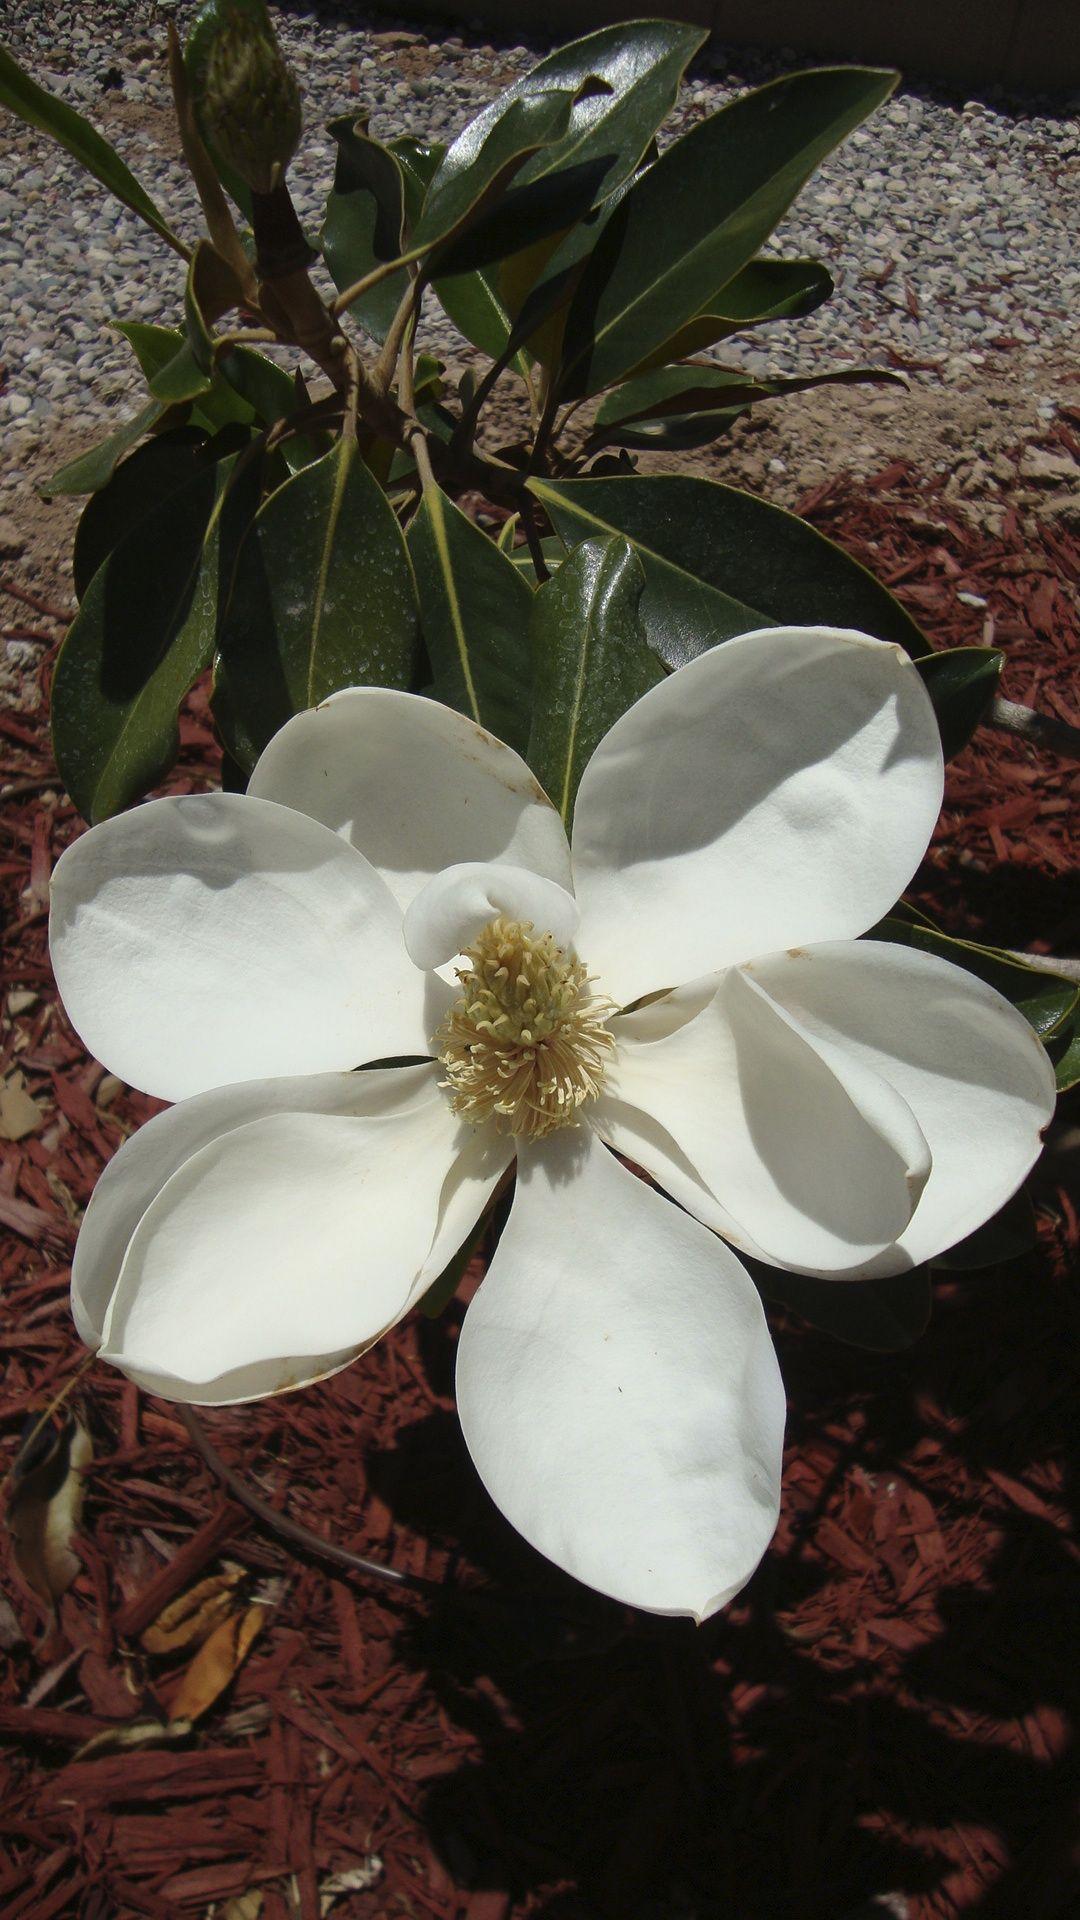 Magnolia Blossom In Tucson Arizona I Have Done The Unthinkable I